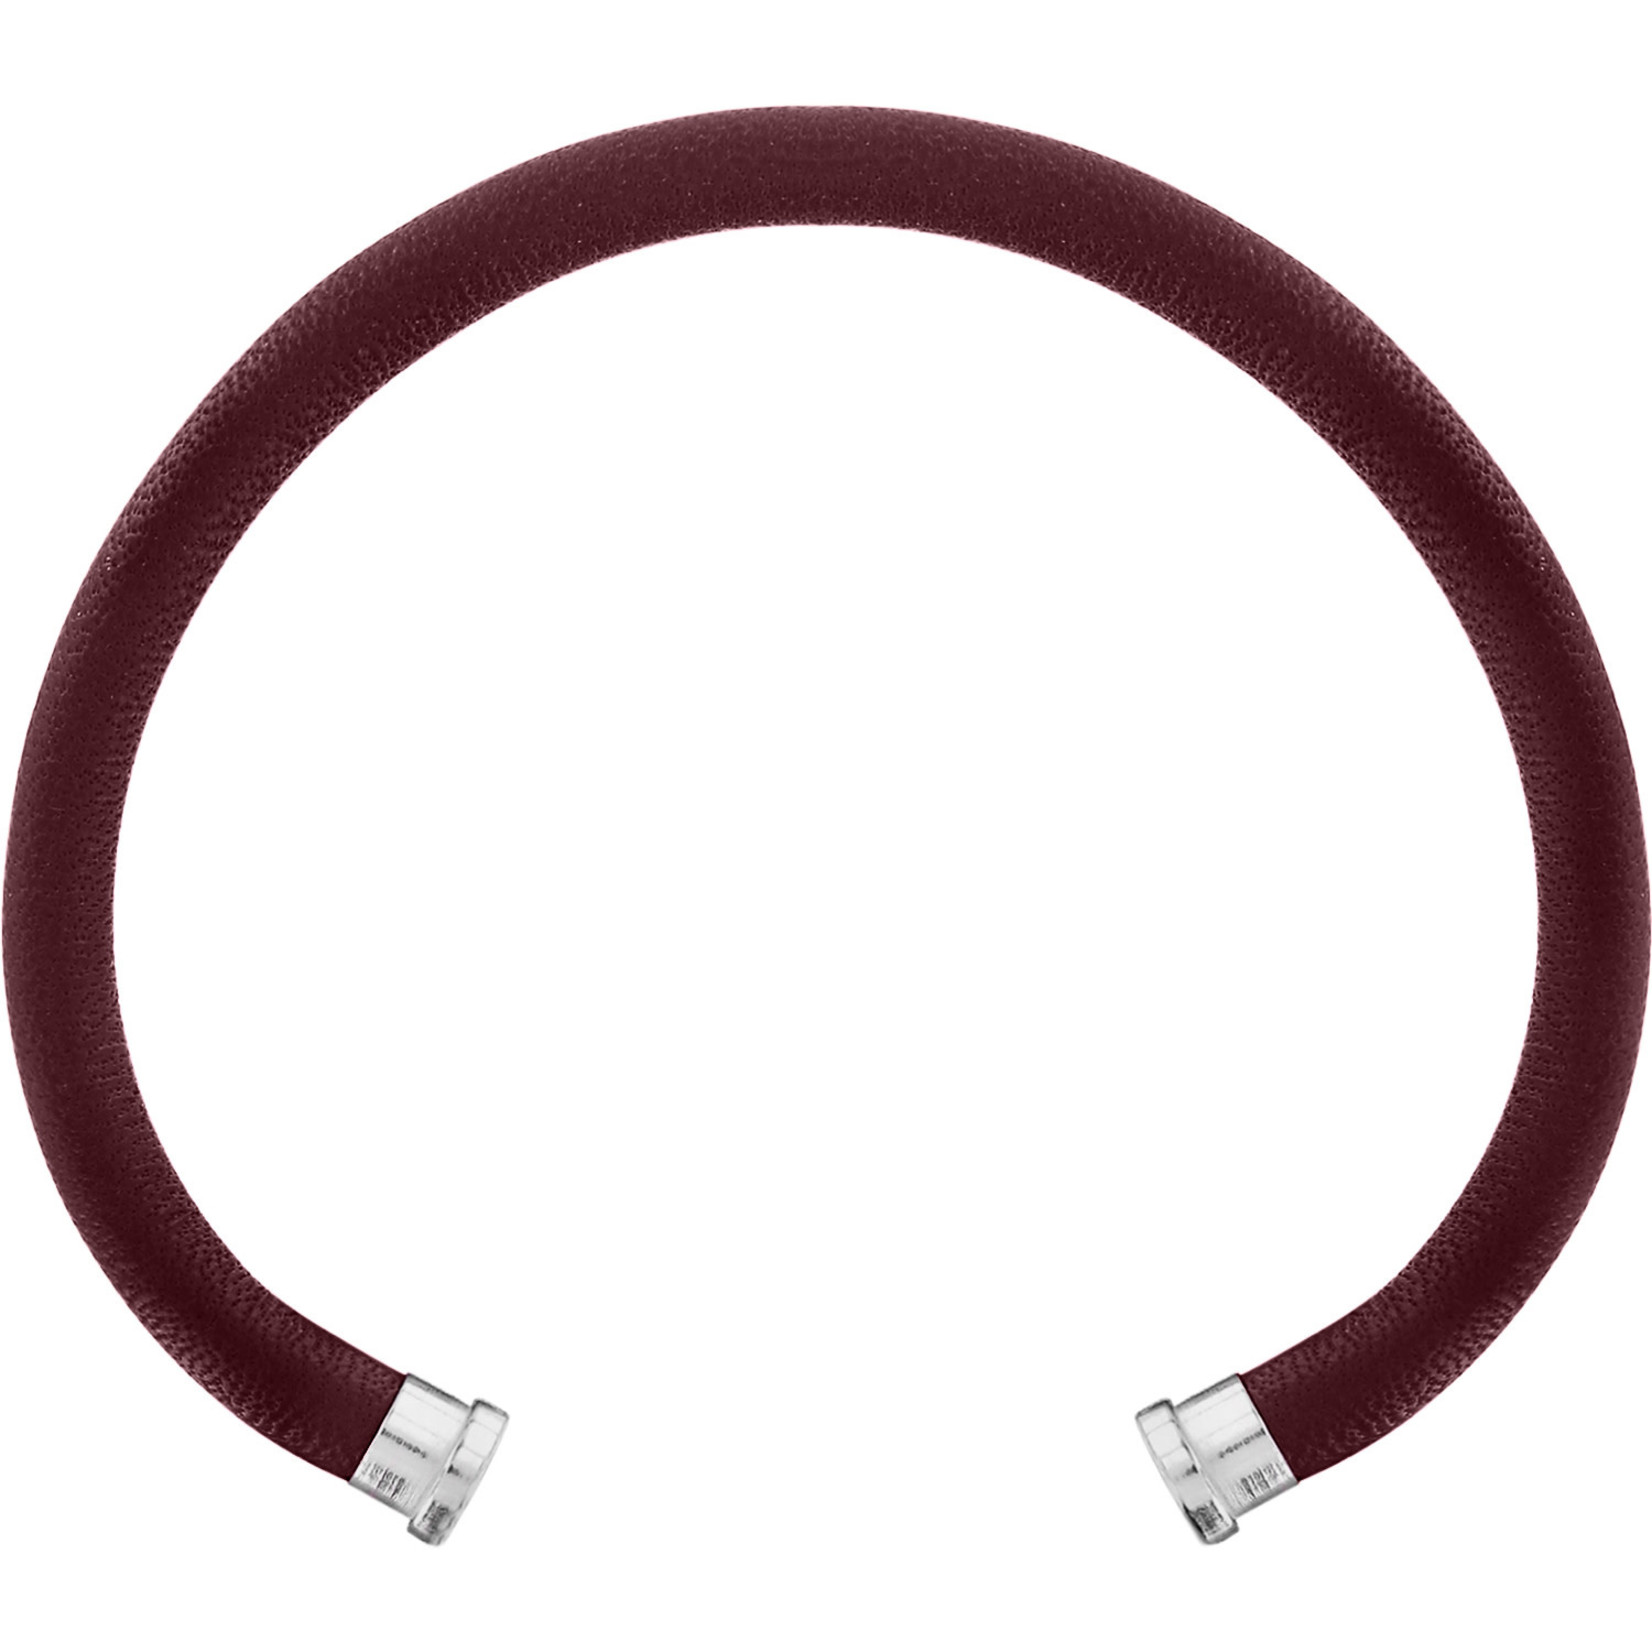 Brighton Color Clique Leather Cord S/M Sangria